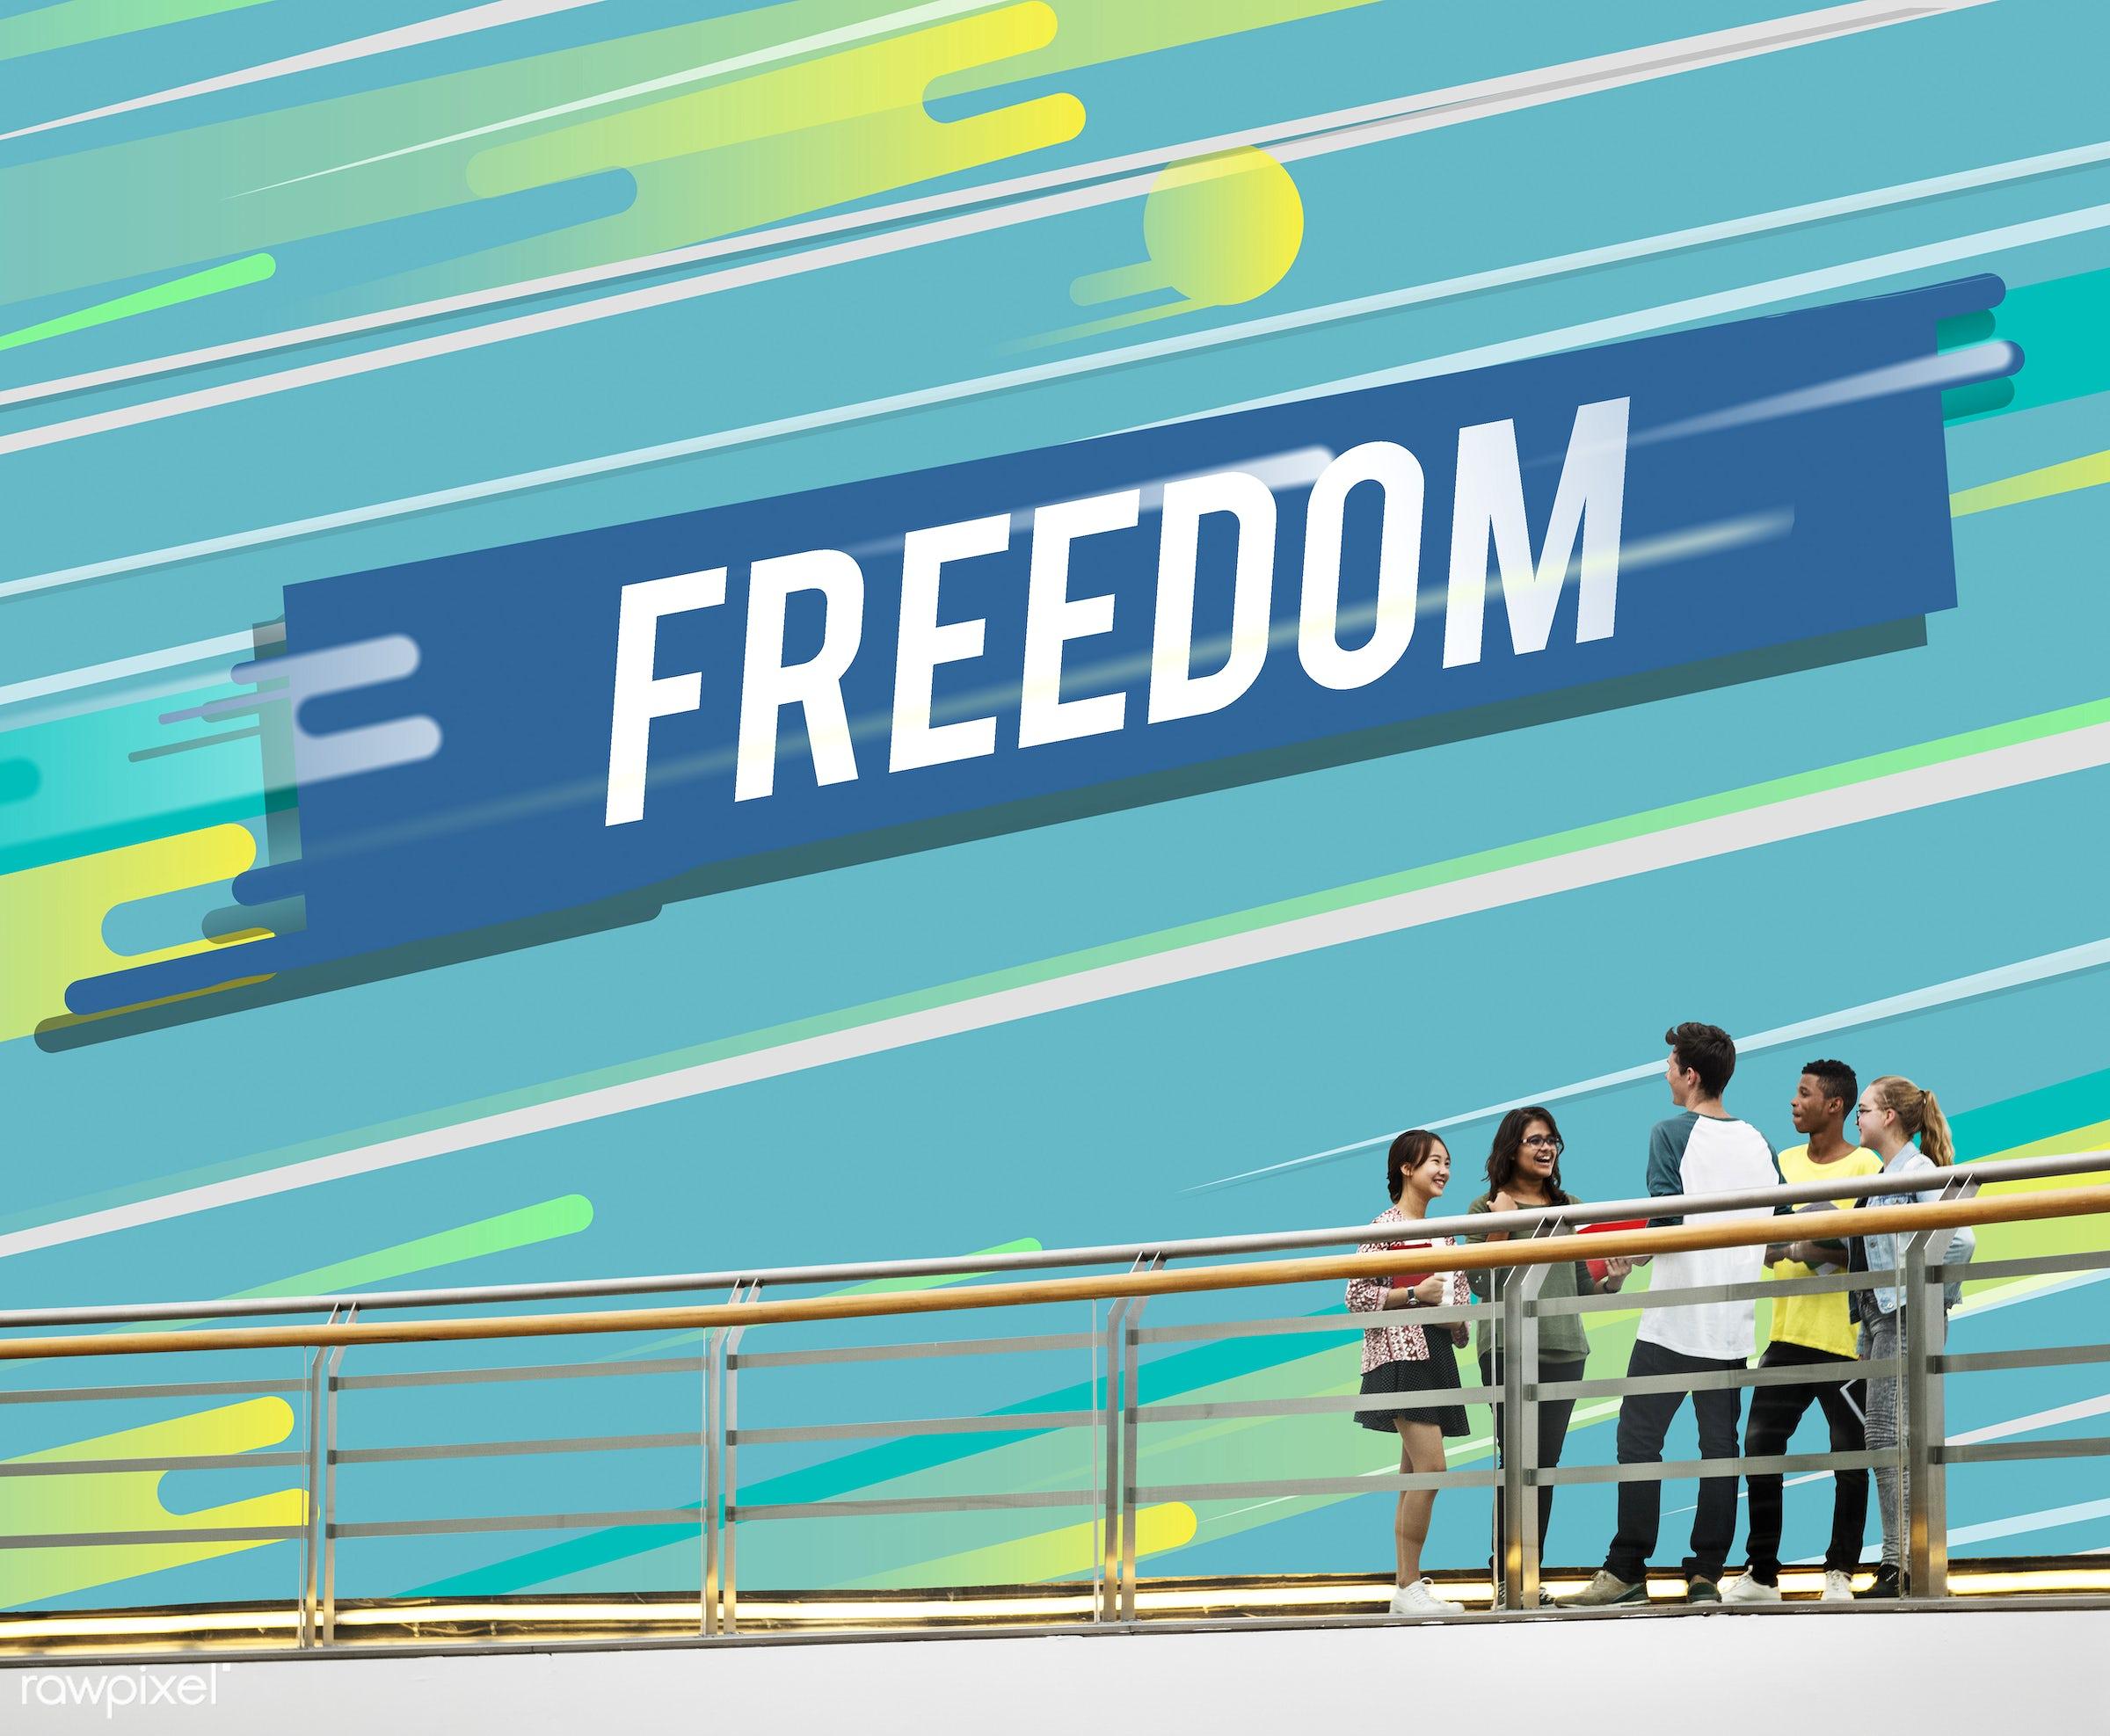 website, book, books, boy, bridge, carrying, community, culture, flexibility, free, freedom, friends, friendship, girls,...